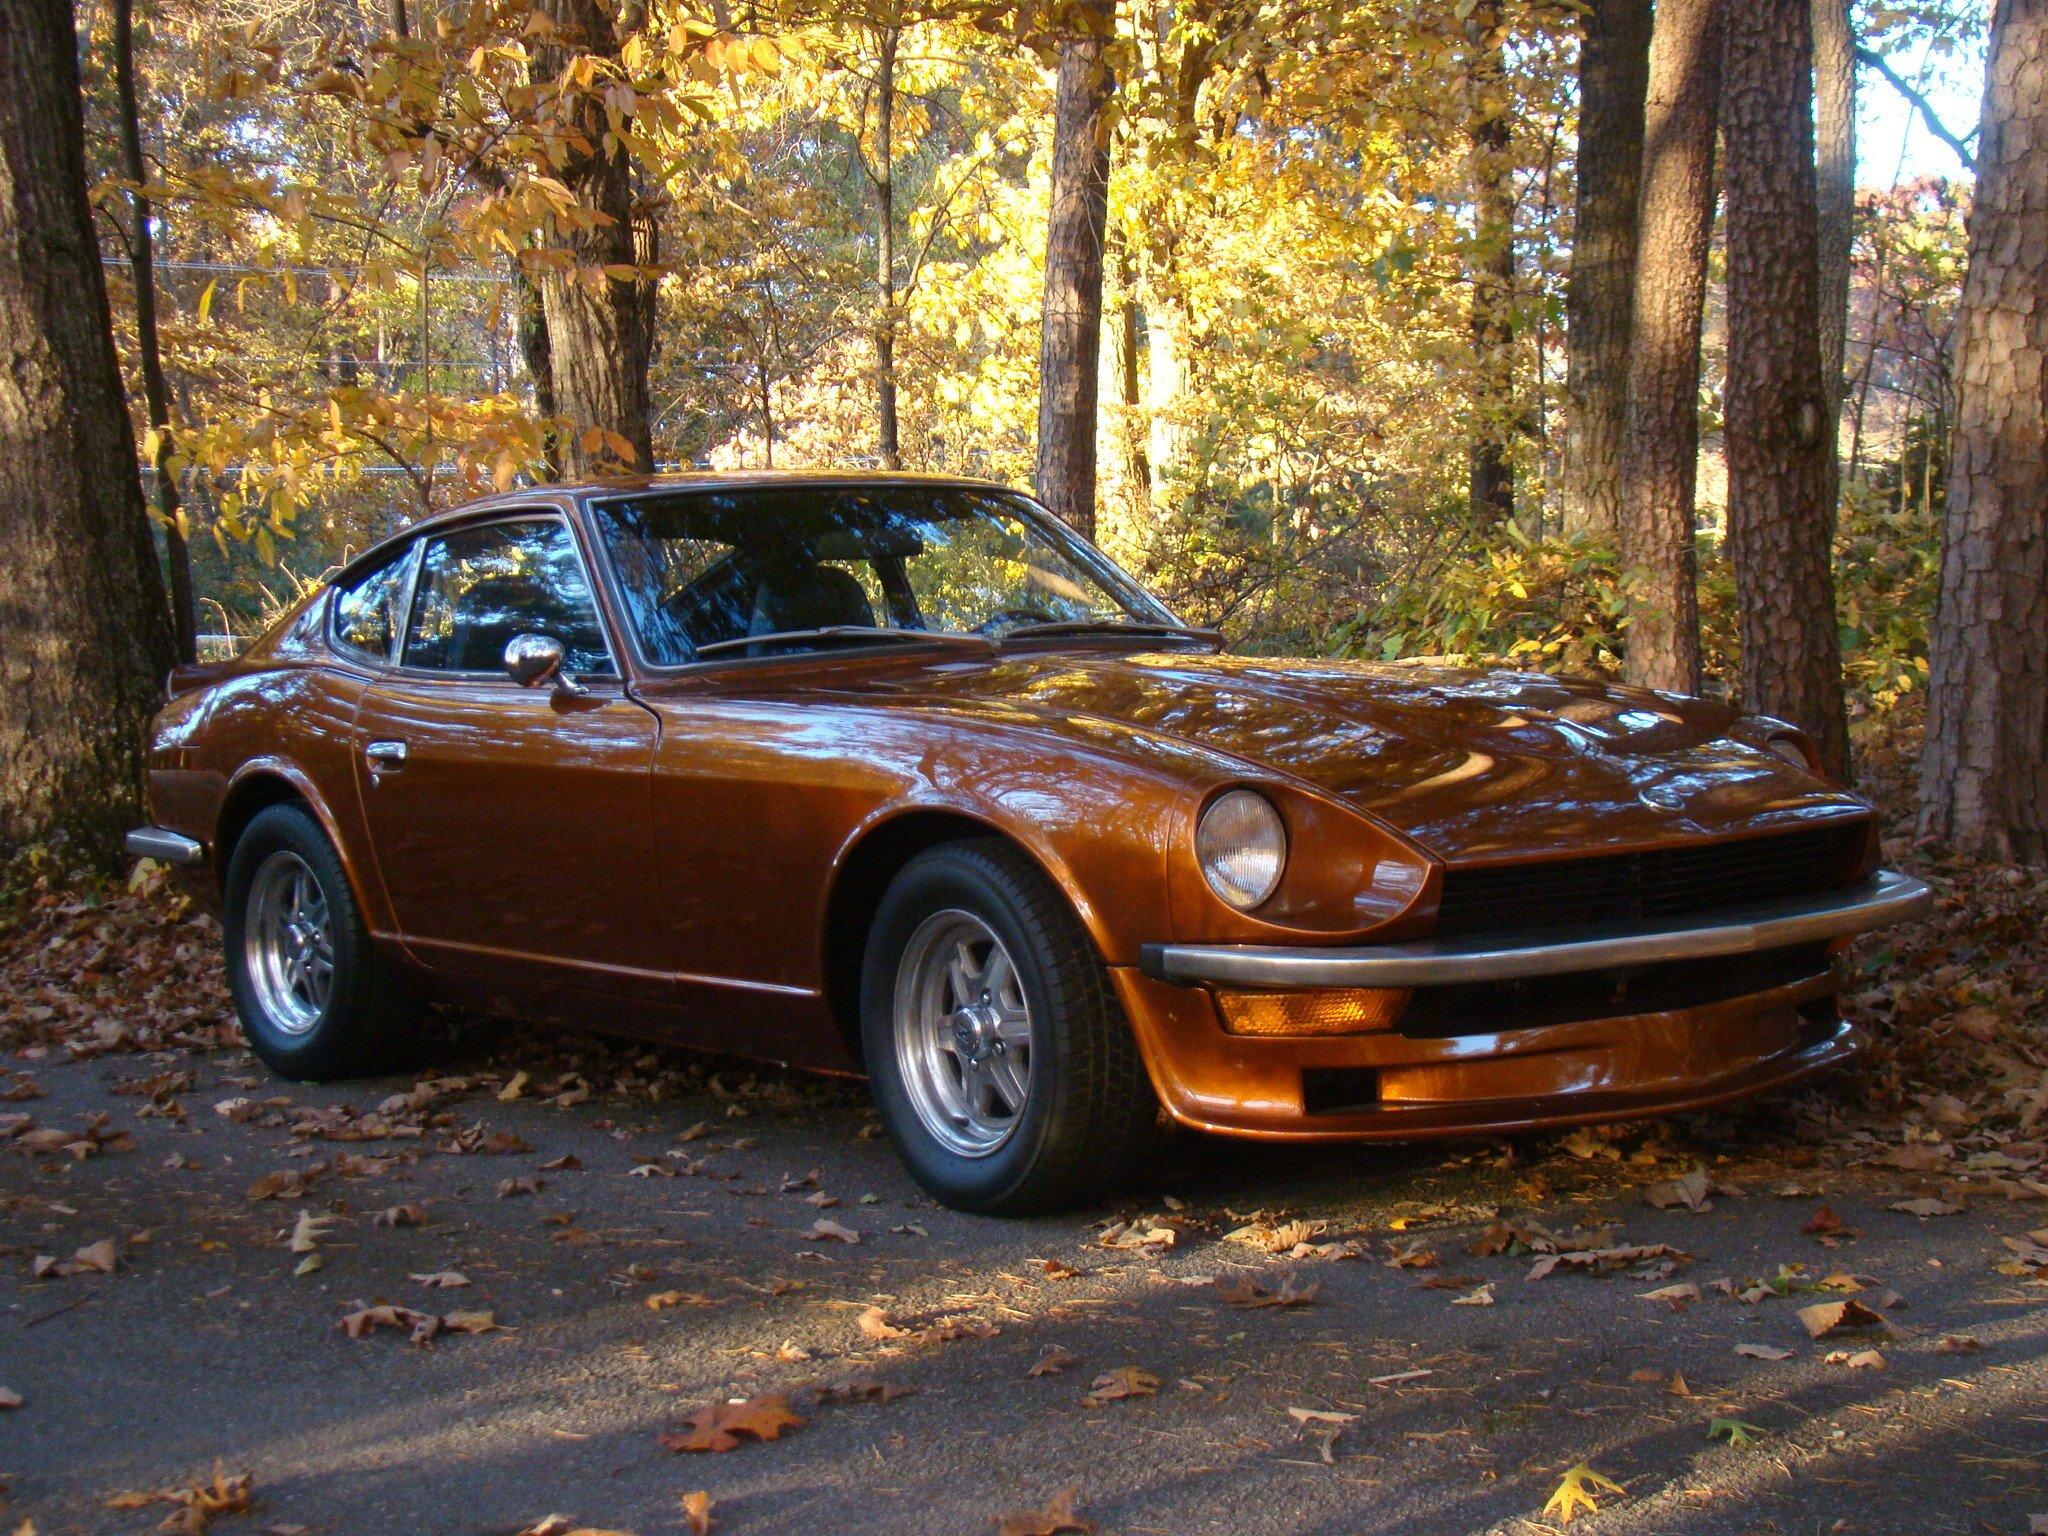 1973 Datsun 240Z Import Classics Car 100889903 715080c13e2b56971963ad402e6a2544?w=1280&h=720&r=thumbnail&s=1 datsun 240z classics for sale classics on autotrader 240z fuse box location at readyjetset.co